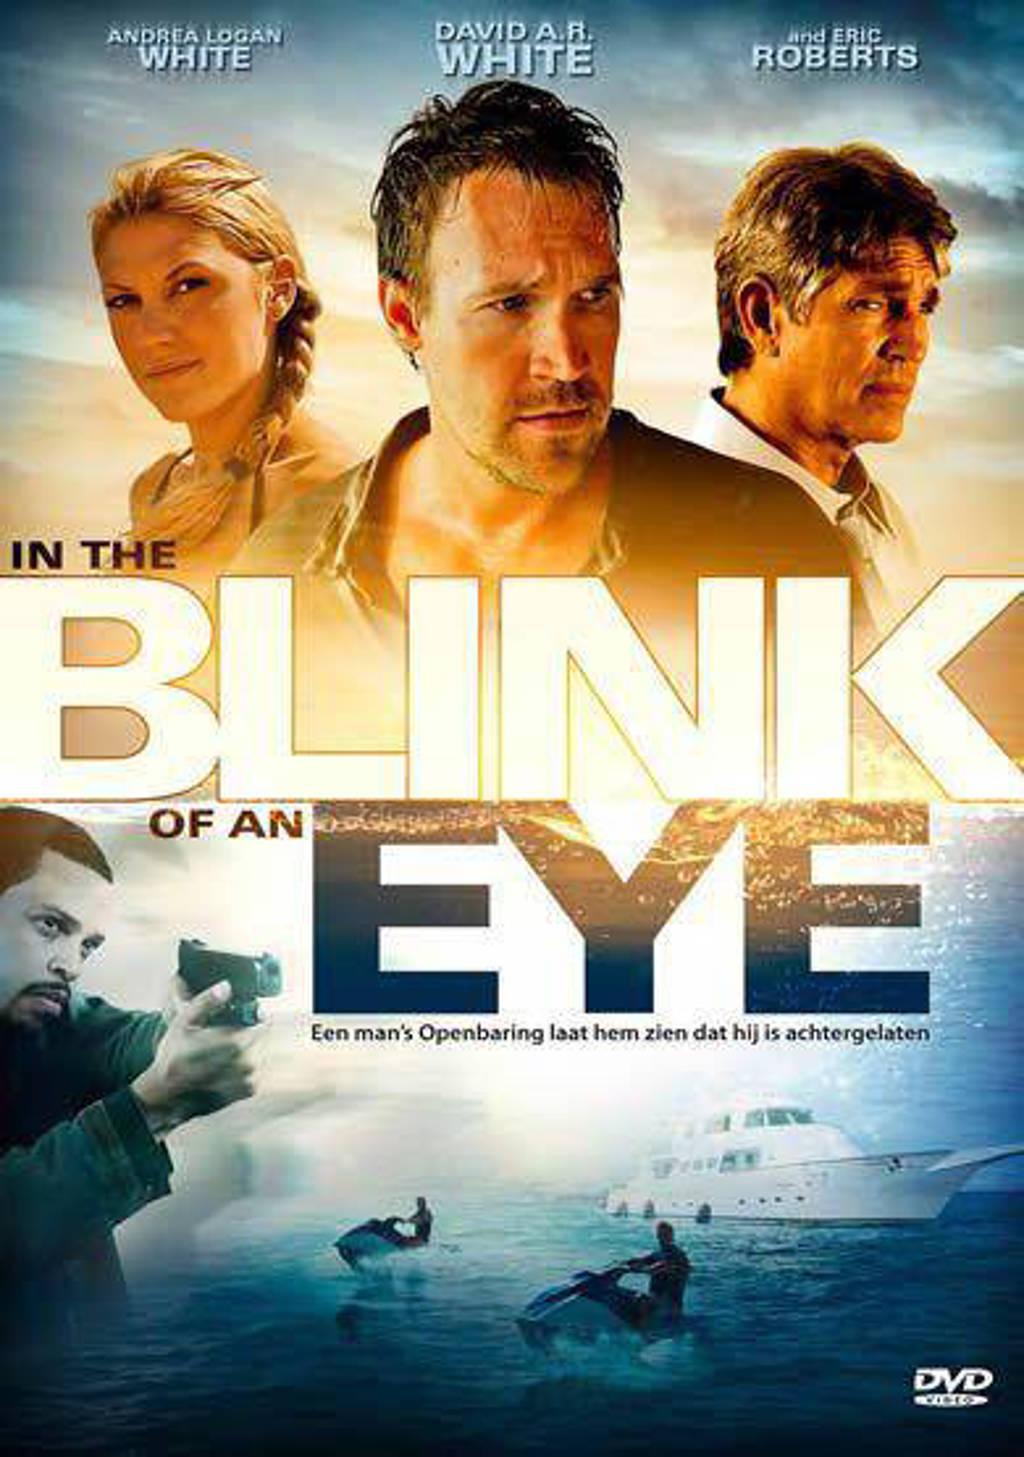 In the blink of an eye (DVD)